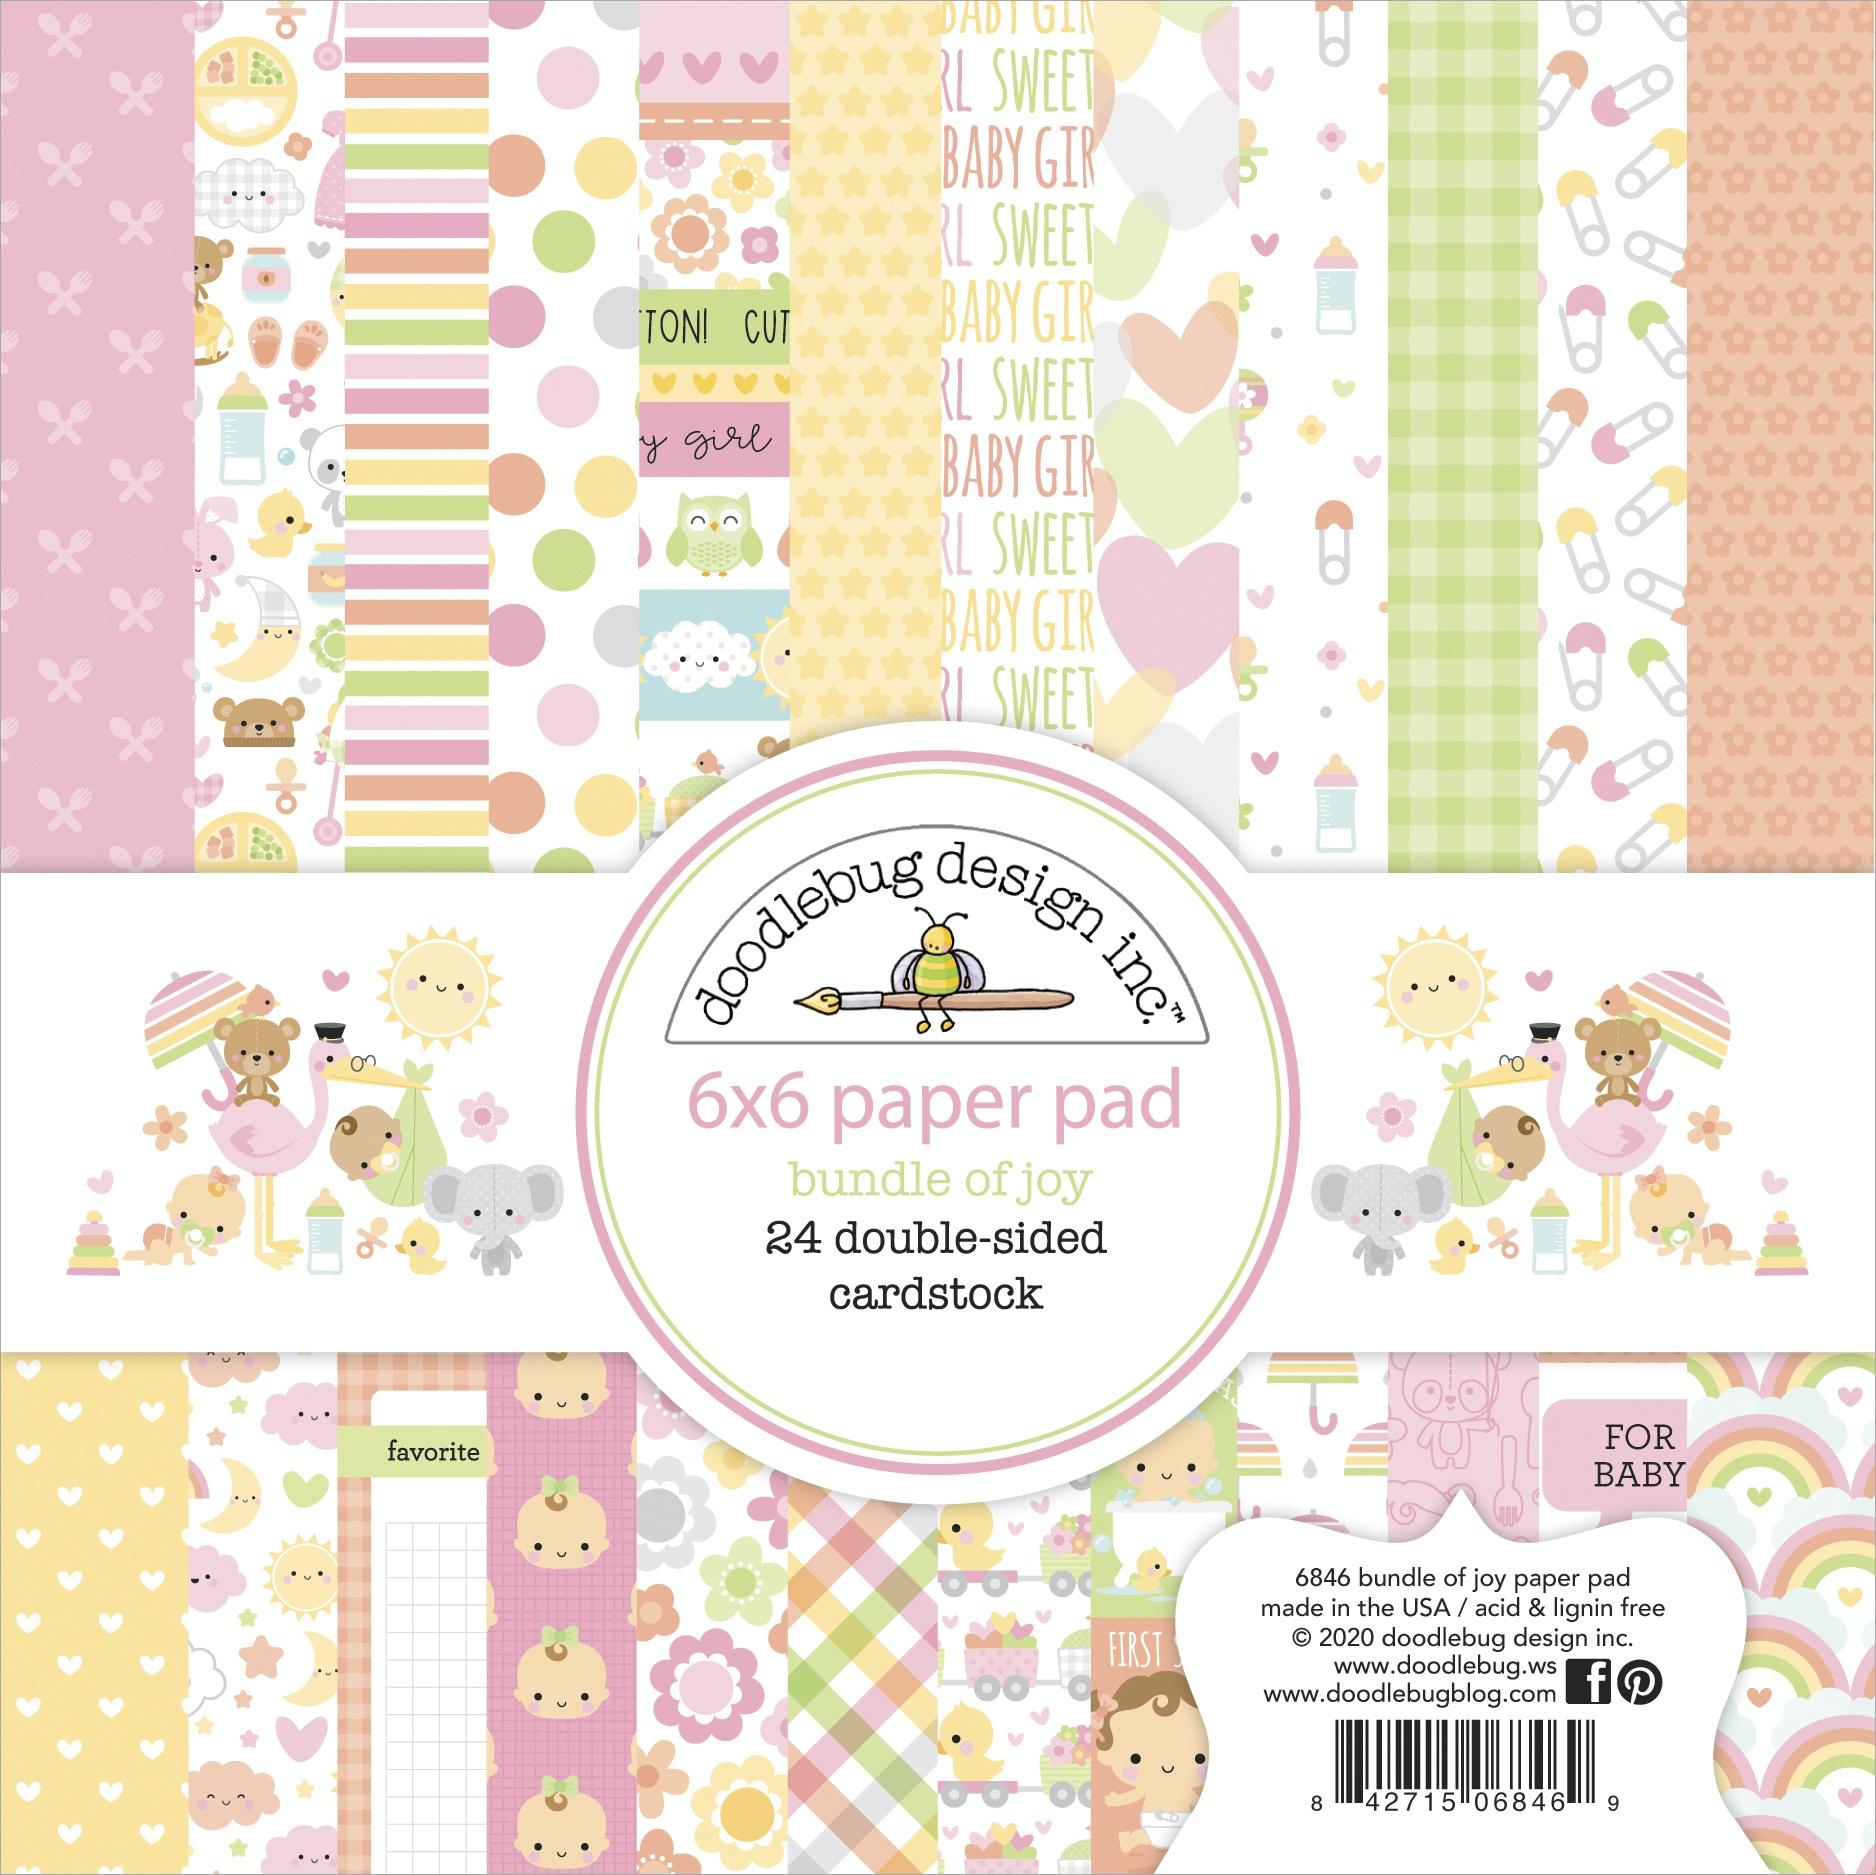 Doodlebug Double-Sided Paper Pad 6X6 24/Pkg-Bundle Of Joy 12 Designs/2 Each